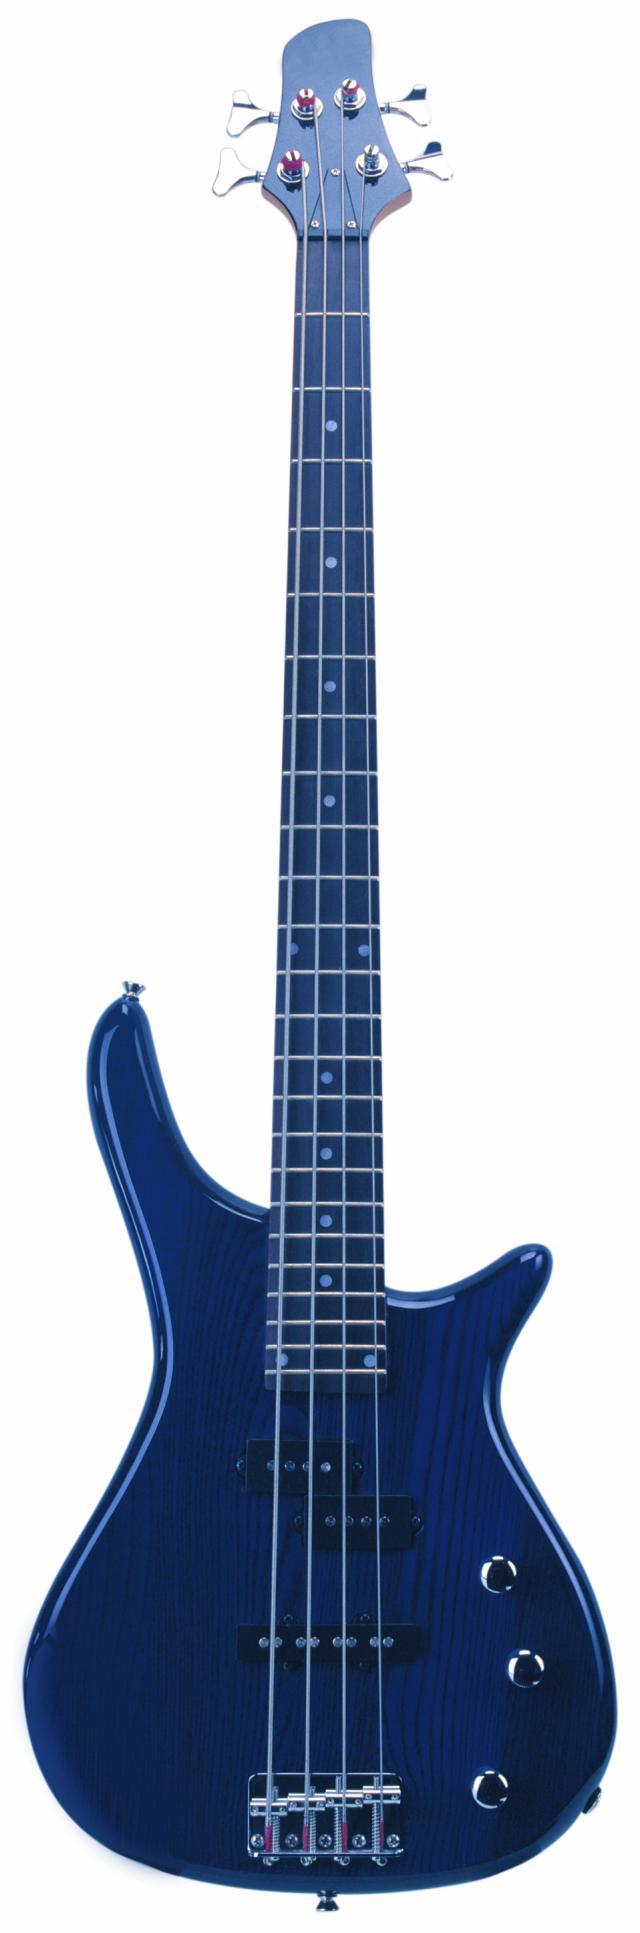 Fotografie Dimavery SB-321 elektrická baskytara, modrá